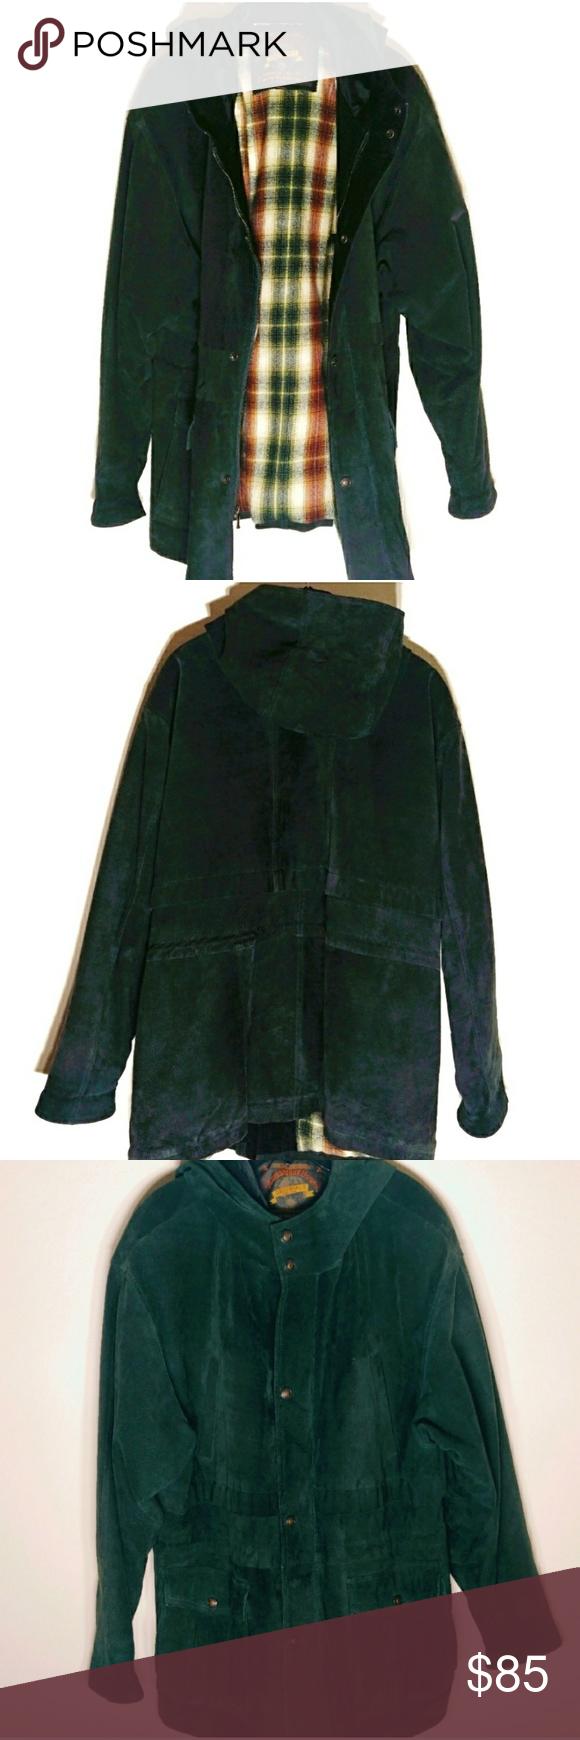 Vintage Adventure Bound 100 Leather coat Large